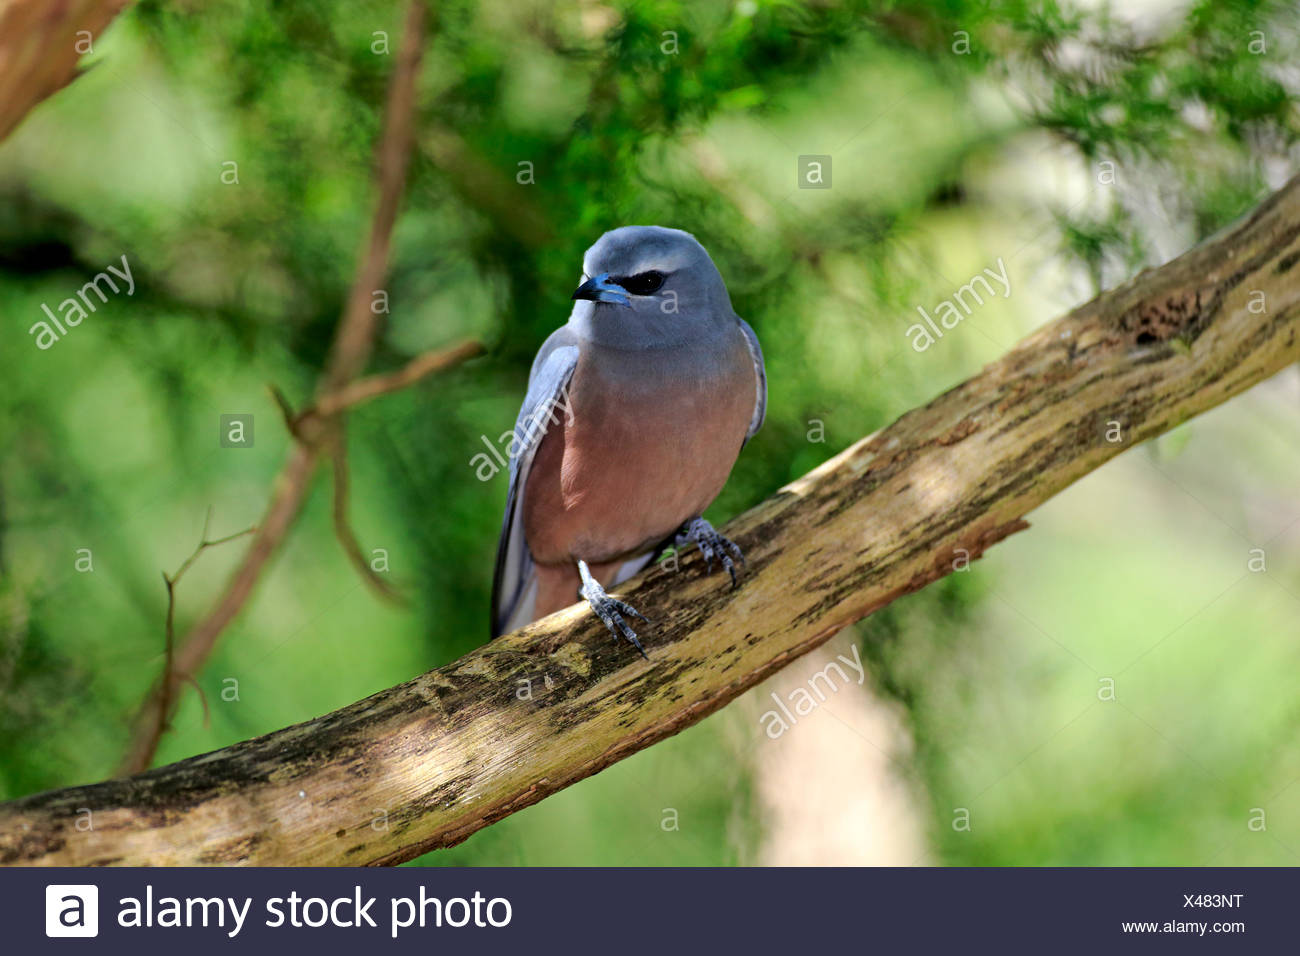 White-browed woodswallow (Artamus superciliosus), adult on tree, South Australia, Australia - Stock Image